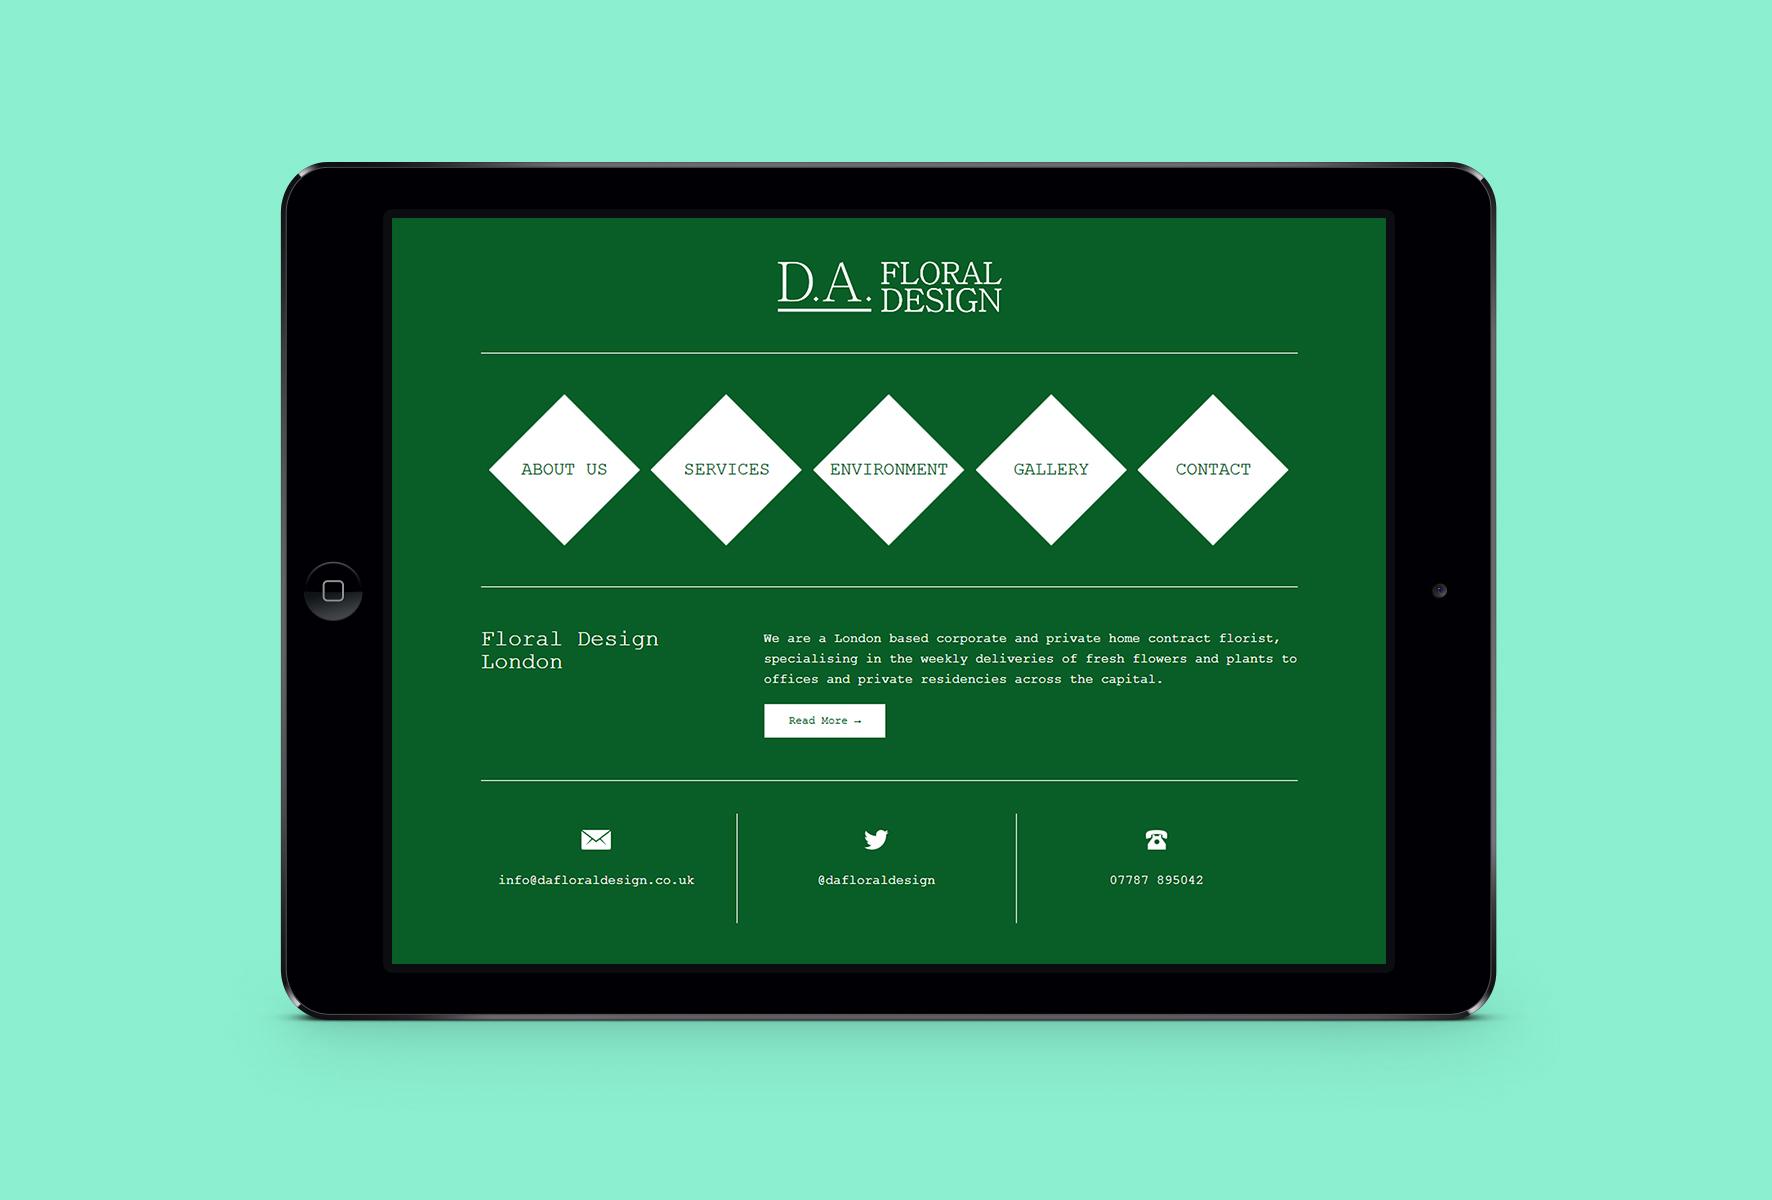 dafloraldesign-homepage-ipad